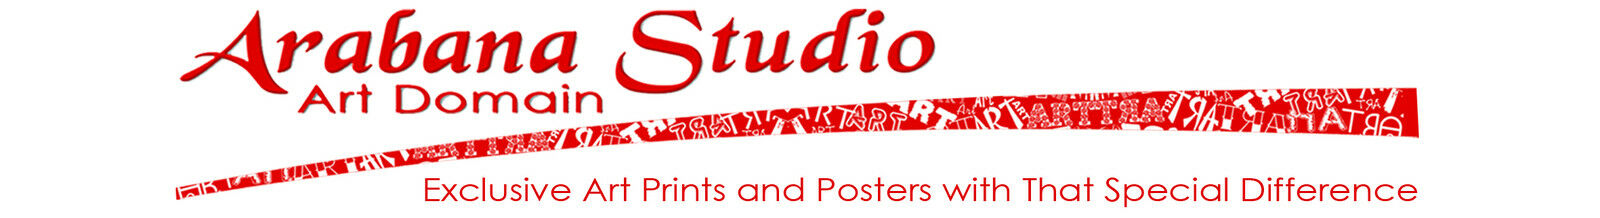 Arabana Studio